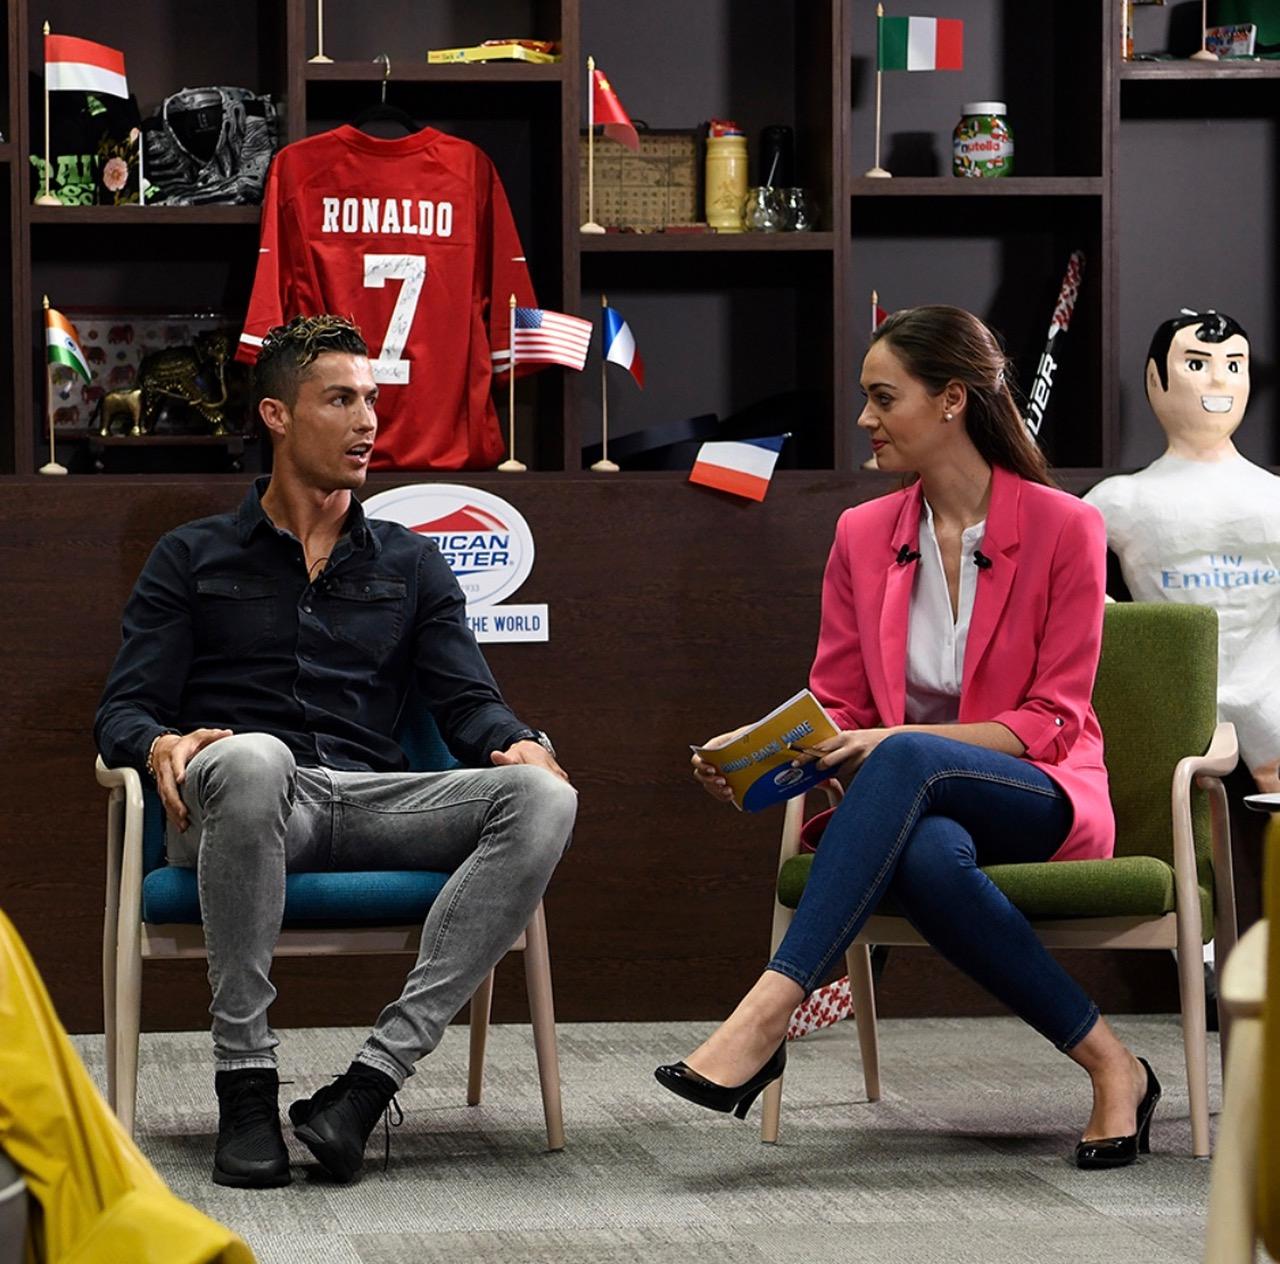 Cristiano Ronaldo - Madrid Spain - Beyond Casual B - American Tourister